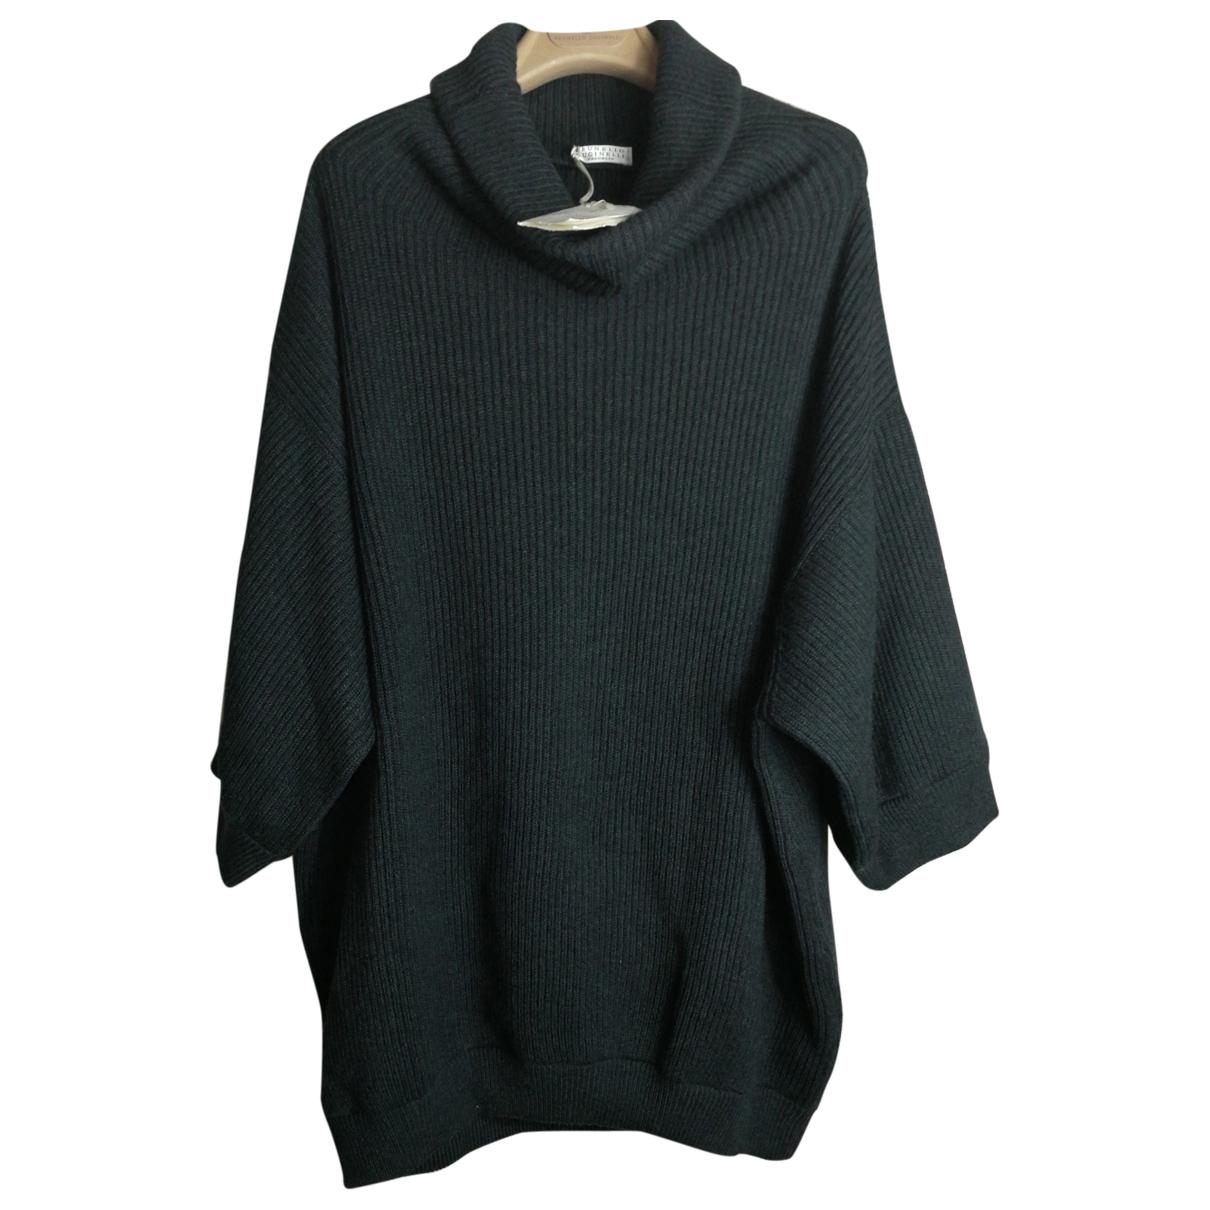 Brunello Cucinelli N Anthracite Cashmere Knitwear for Women L International